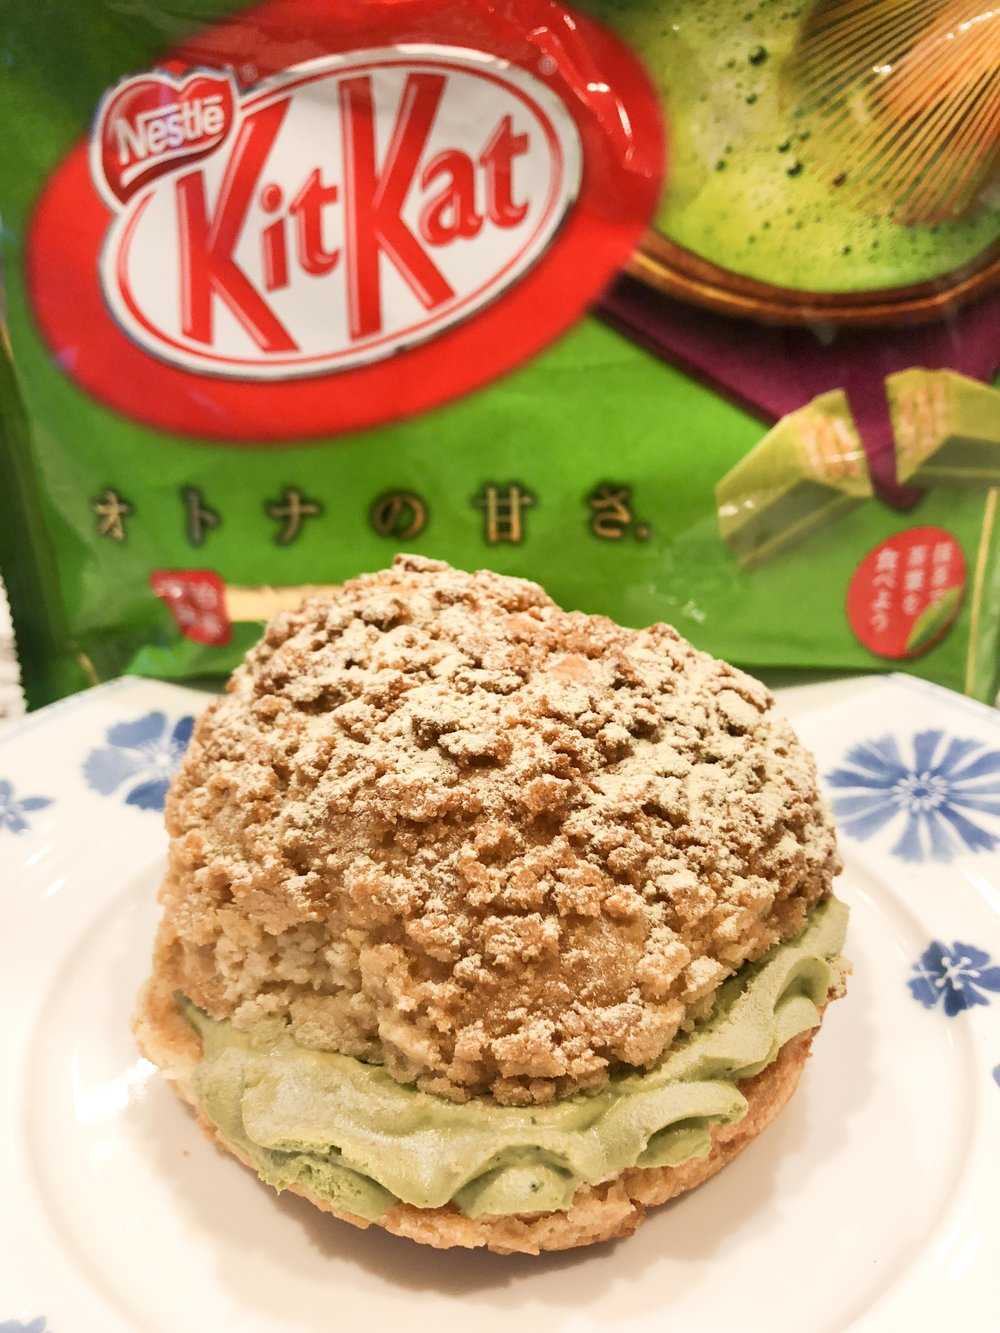 Matcha Flavored Cream Puff and Kit Kats